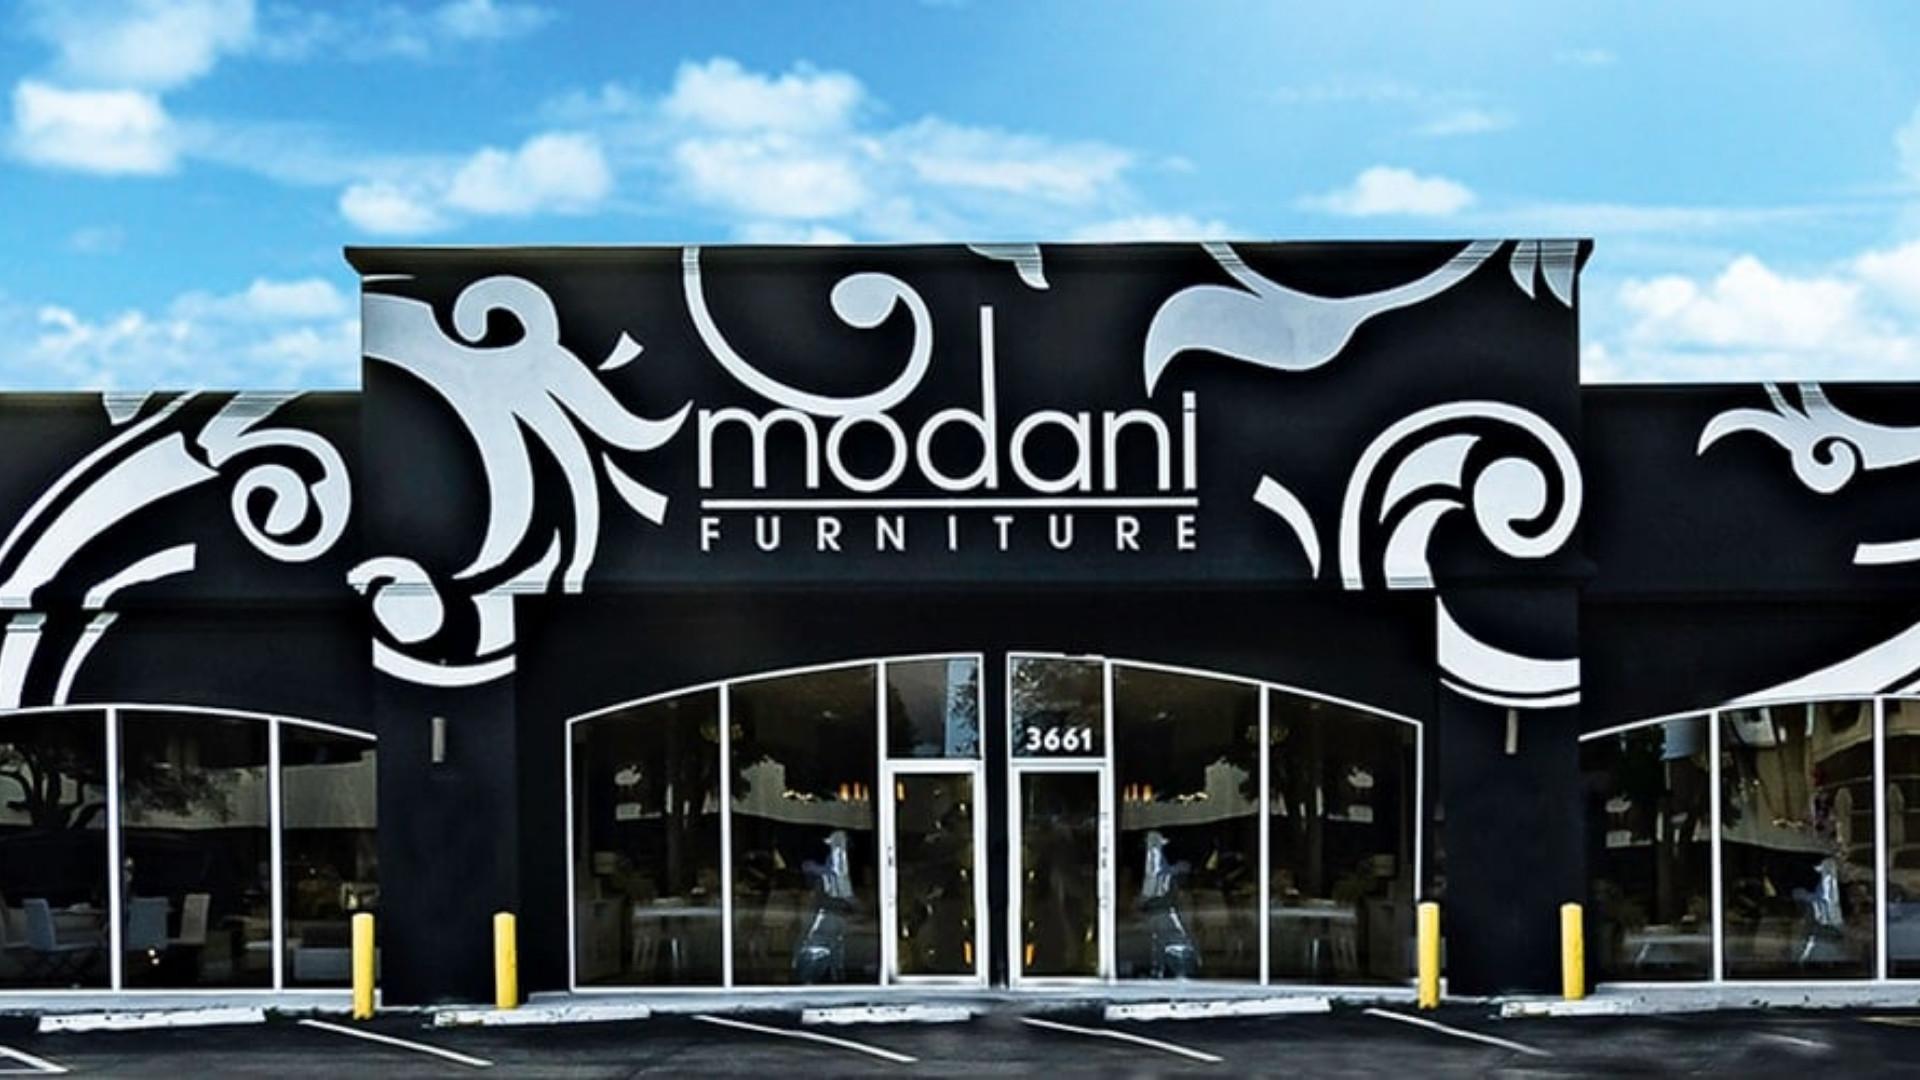 Modani Furniture Fort Lauderdale reviews   Furniture Stores at 3661 N Federal Hwy - Fort Lauderdale FL